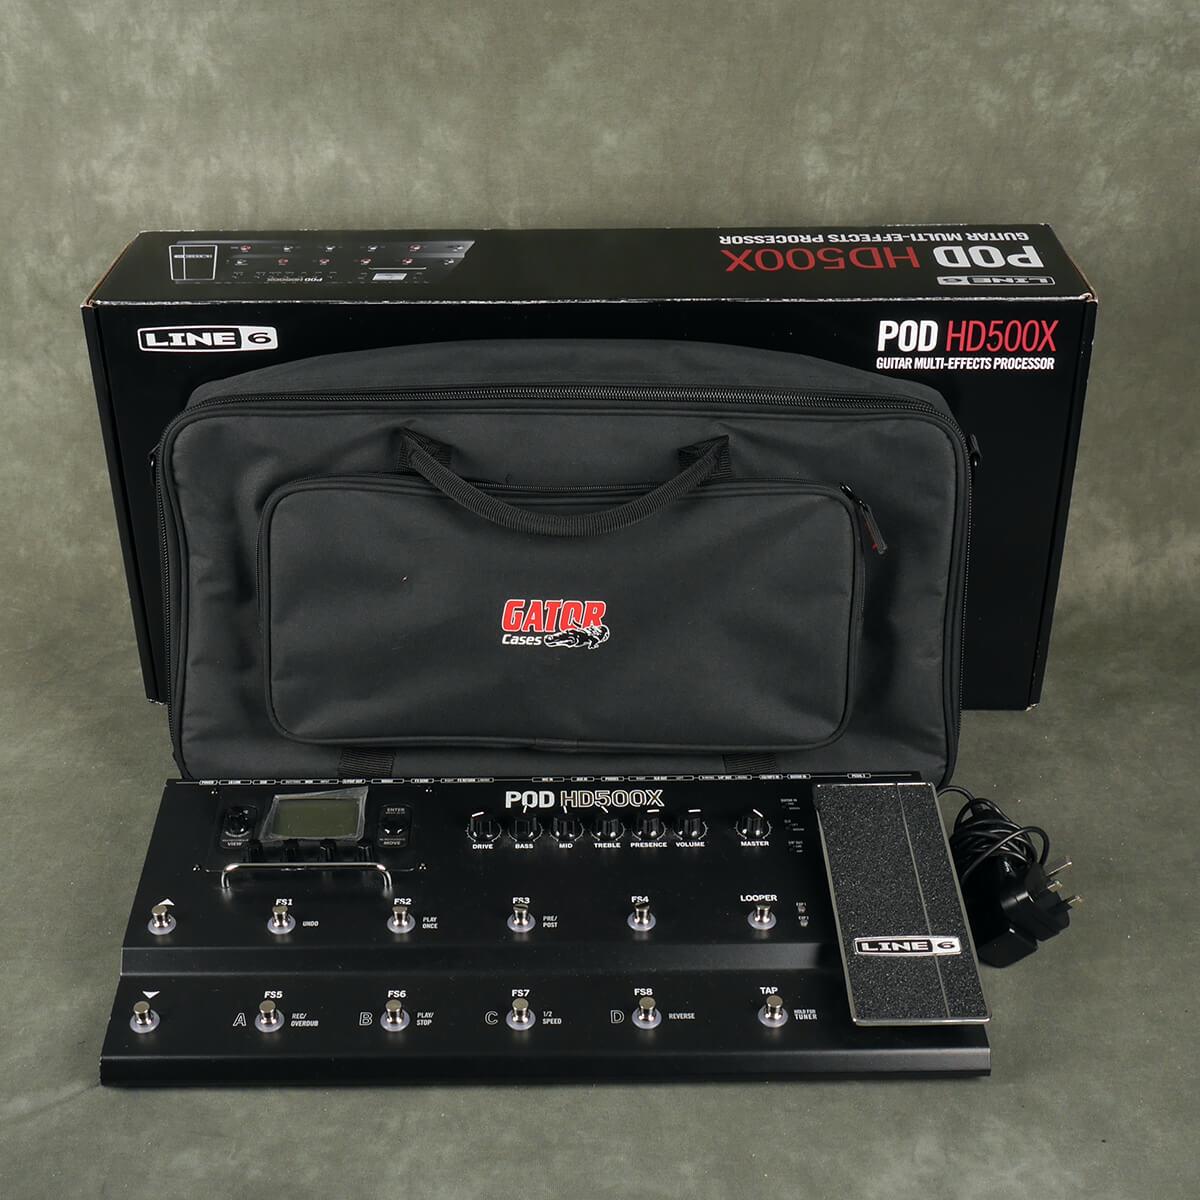 Line 6 POD HD500X FX Floorboard & Gigbag w/Box & PSU - 2nd Hand